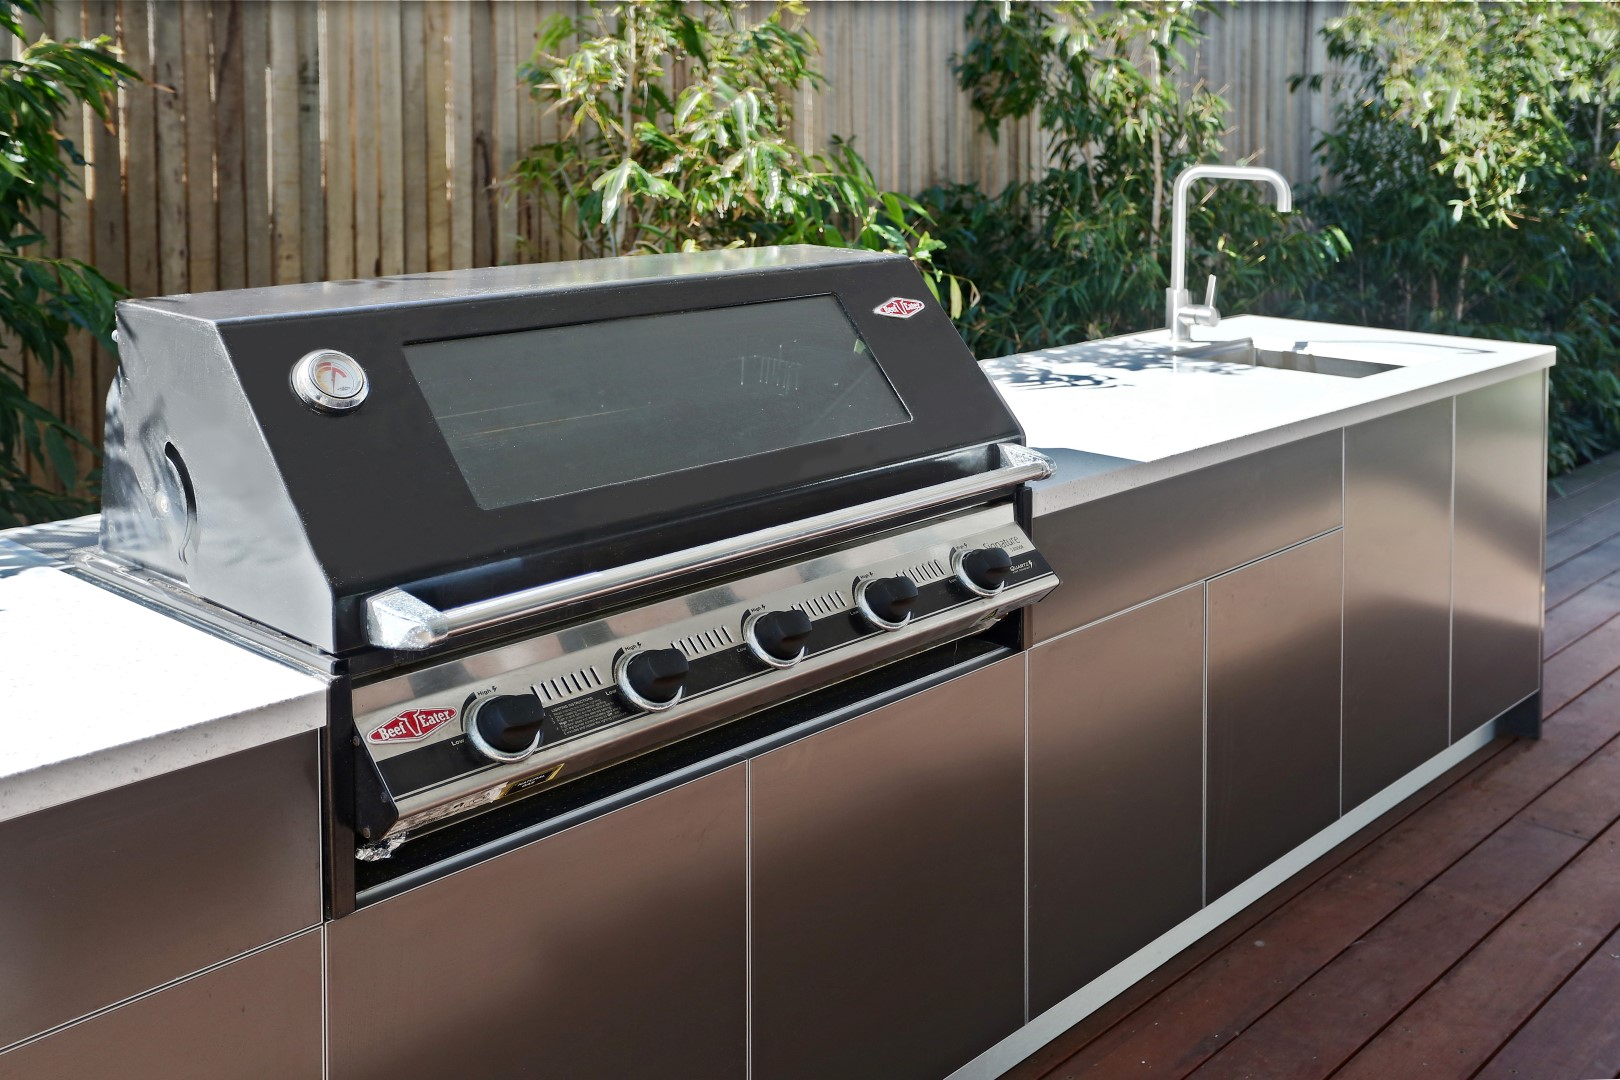 Beefeater 3000E 5 BNR Metallic Charcoal Corian Silver Birch Outdoor Kitchen 10LR